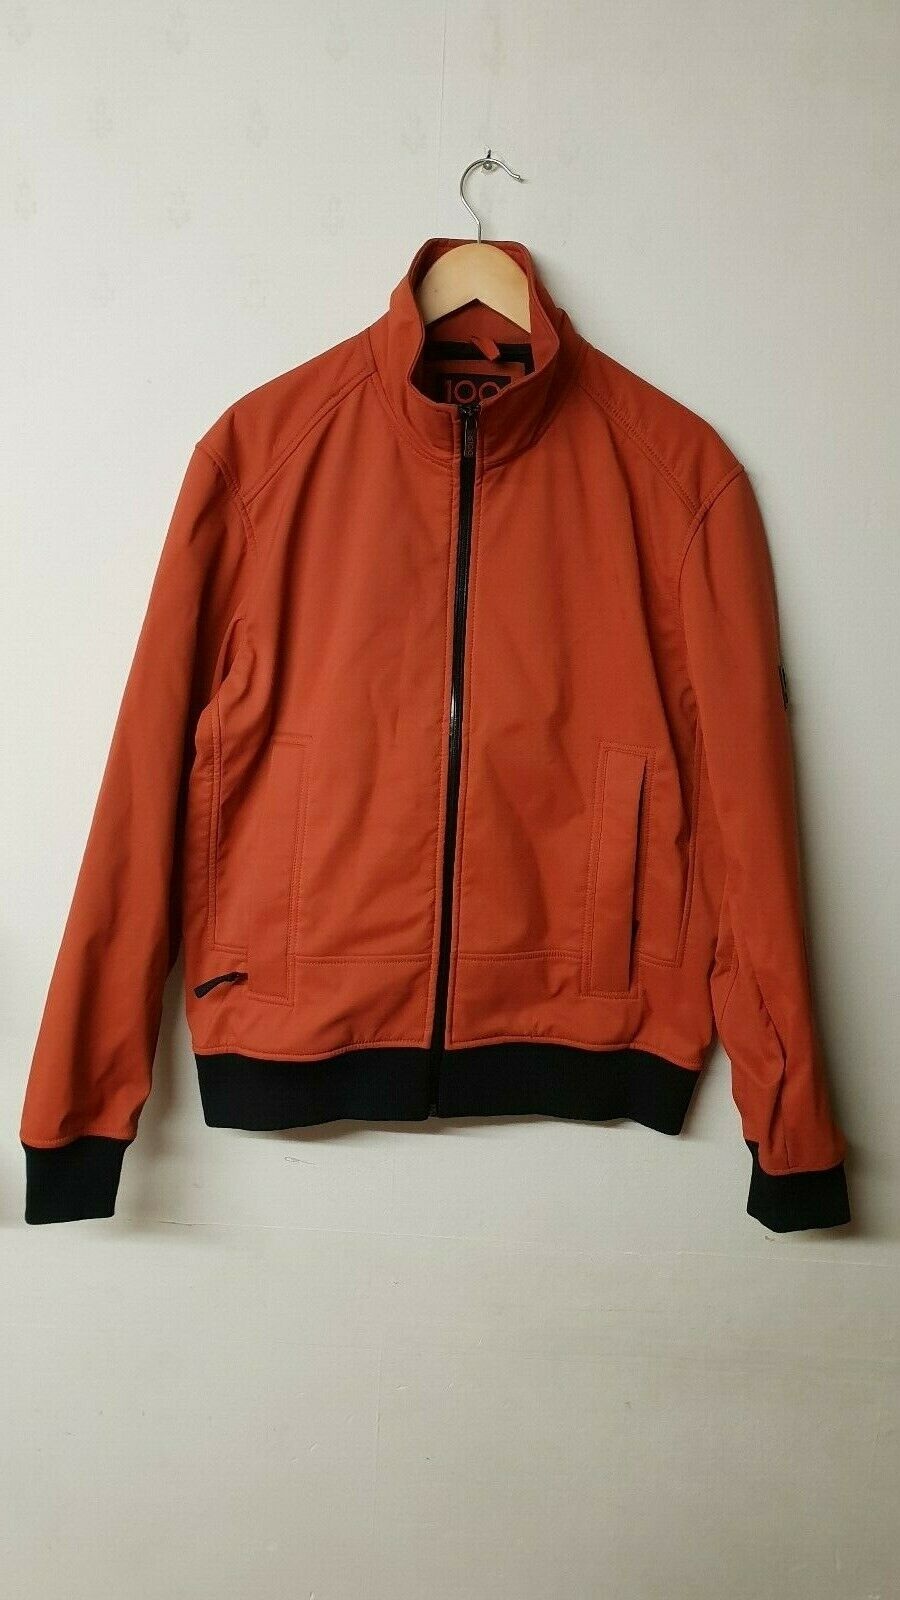 Karrimor 100 womens K100-15-SS01 COAT orange SIZE XL RRP